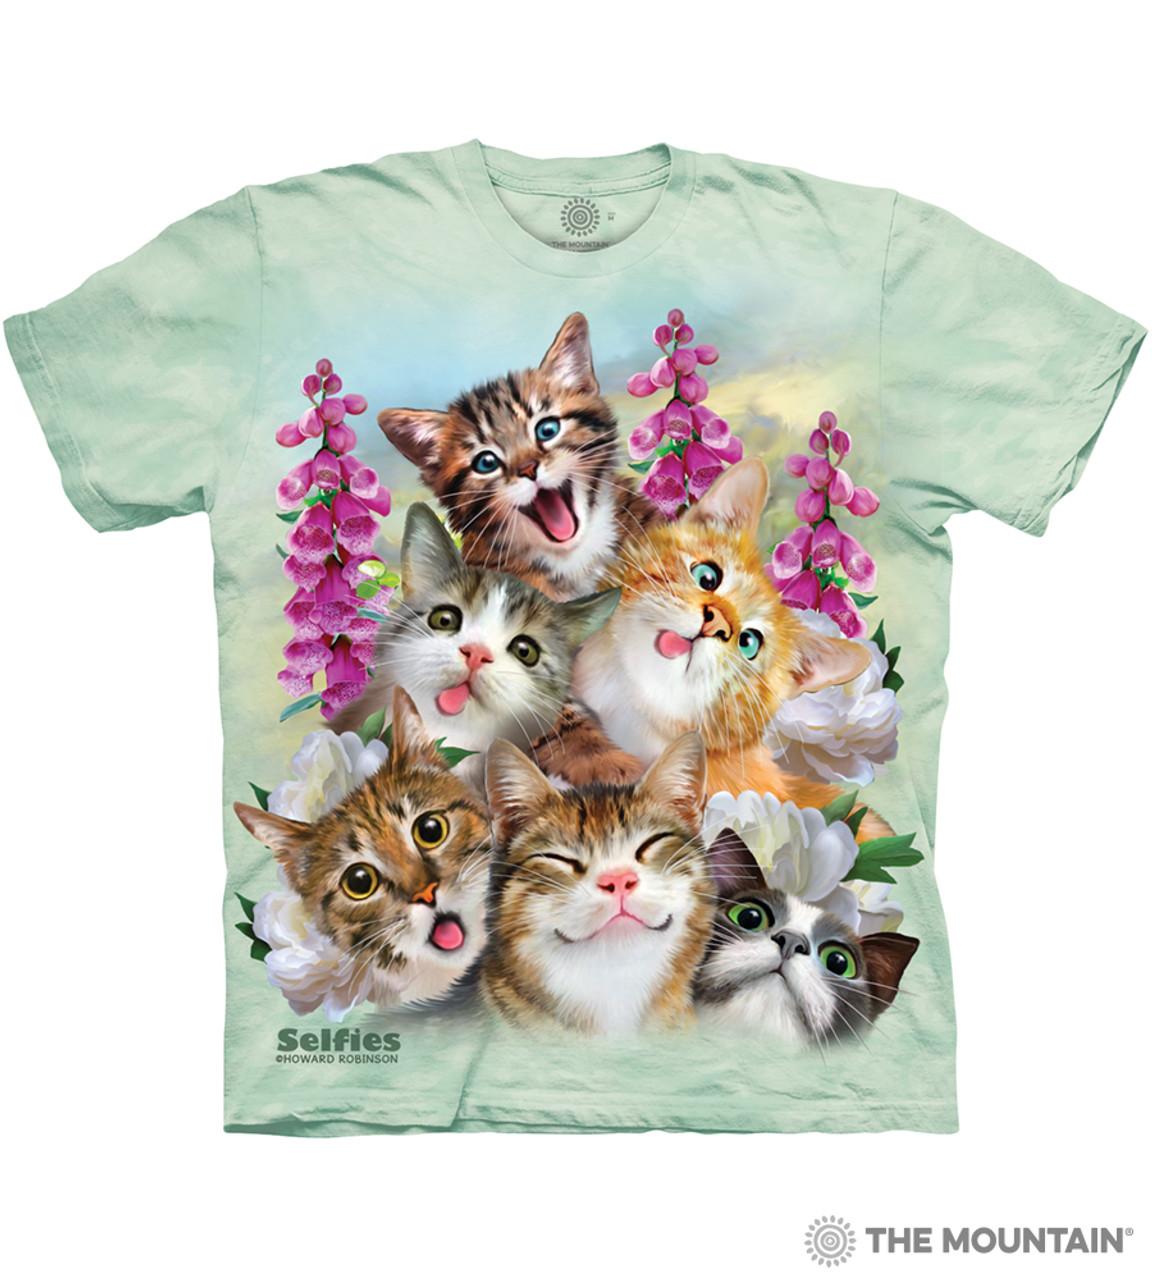 LAZY CAT , T-SHIRT Not Today Crazy Cat Funny Kitty Tshirt Top Sleepy Lazy